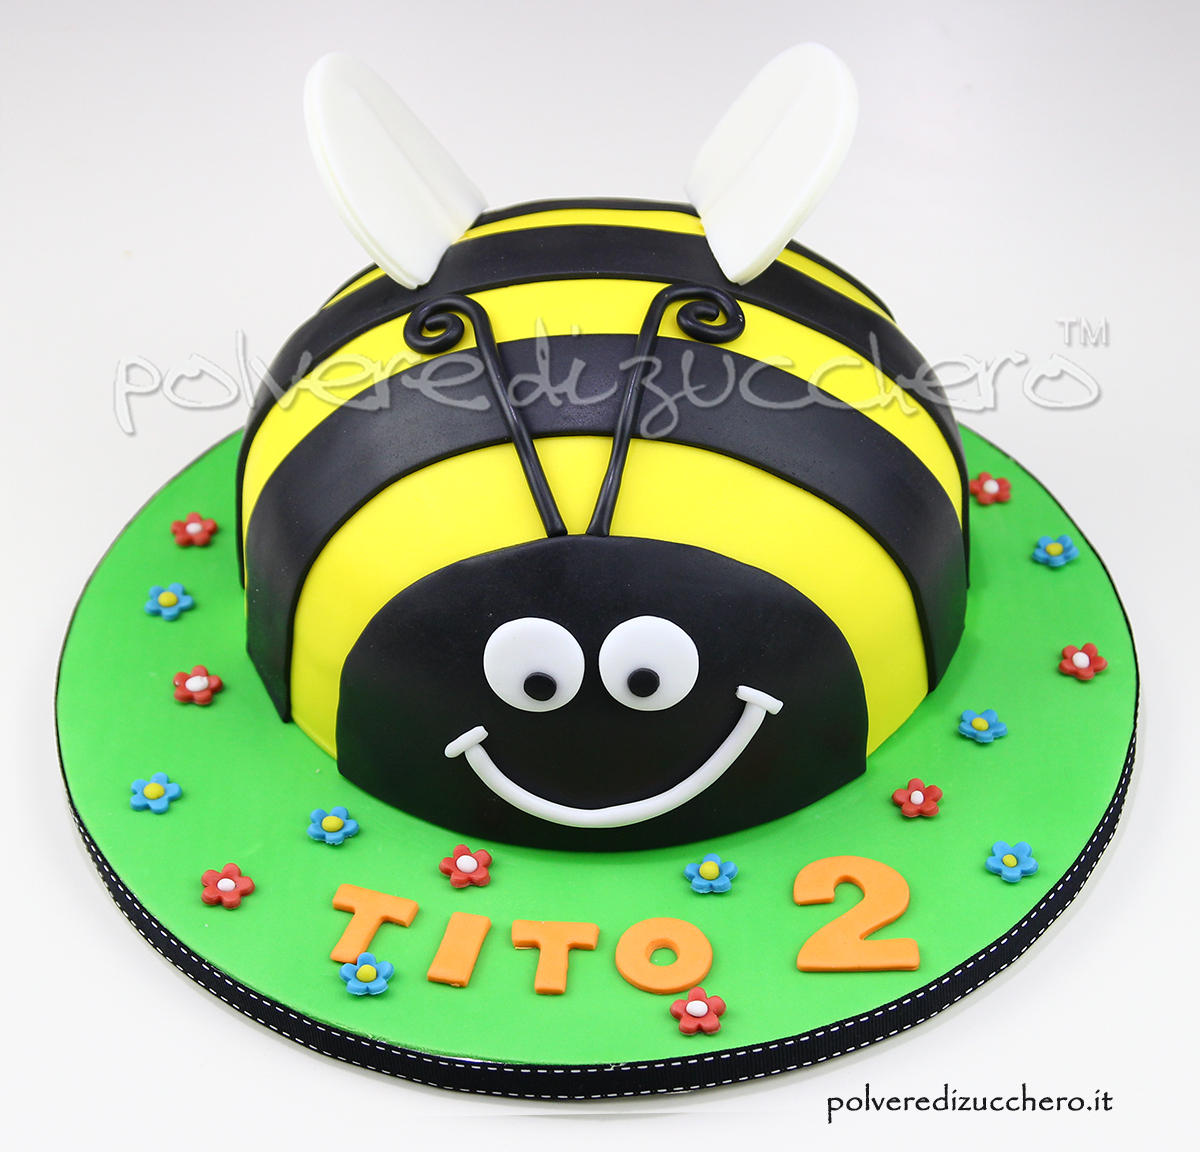 cake design ape torta a forma di ape pasta di zucchero polvere di zucchero compleanno bimbo